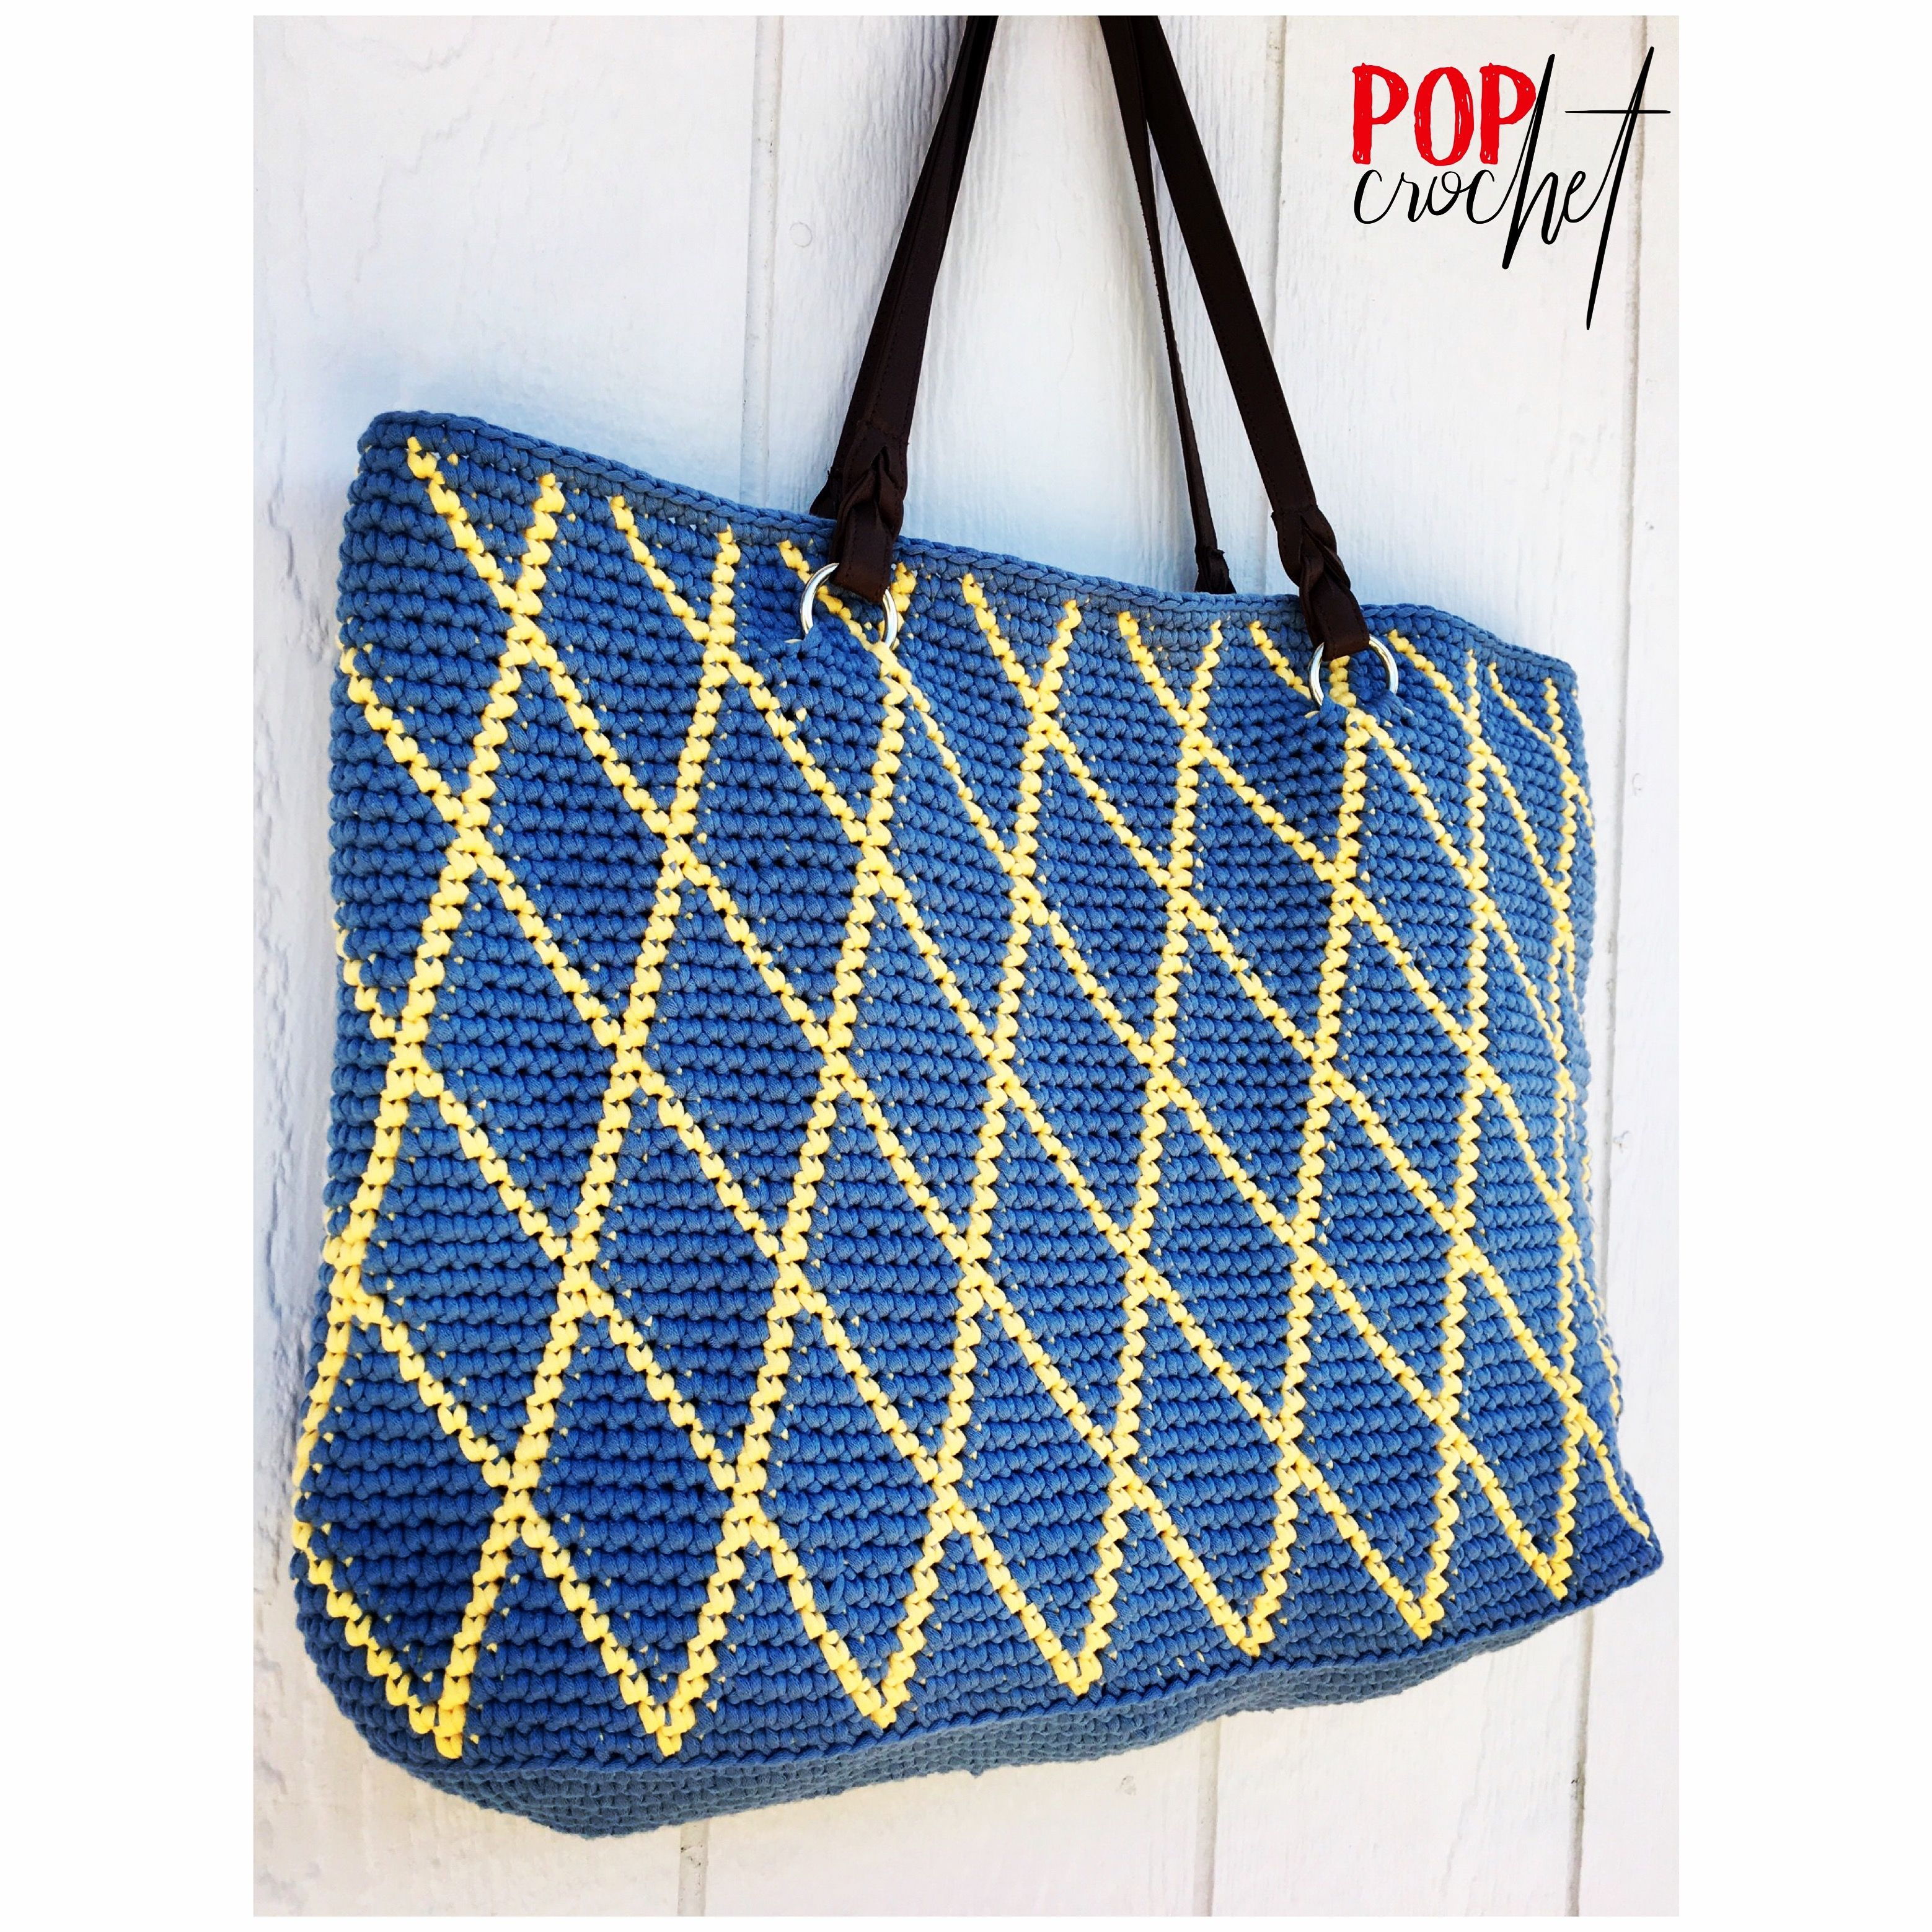 Crisscross Pattern Diana Crochet Tote Bag